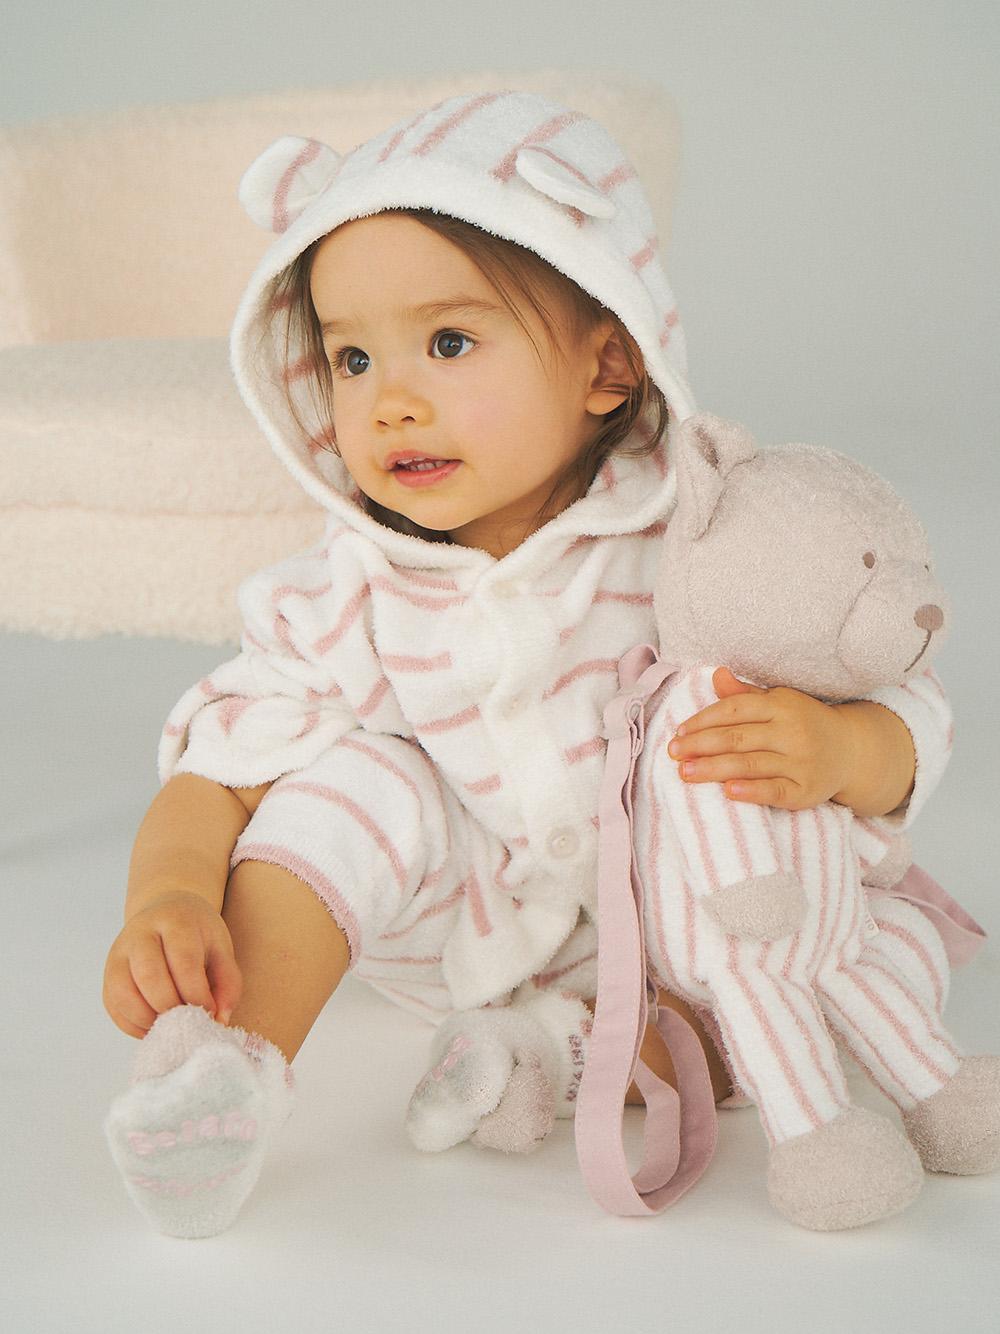 【BABY】'スムーズィー'ボーダーベアモチーフ baby ソックス | PBGS211722